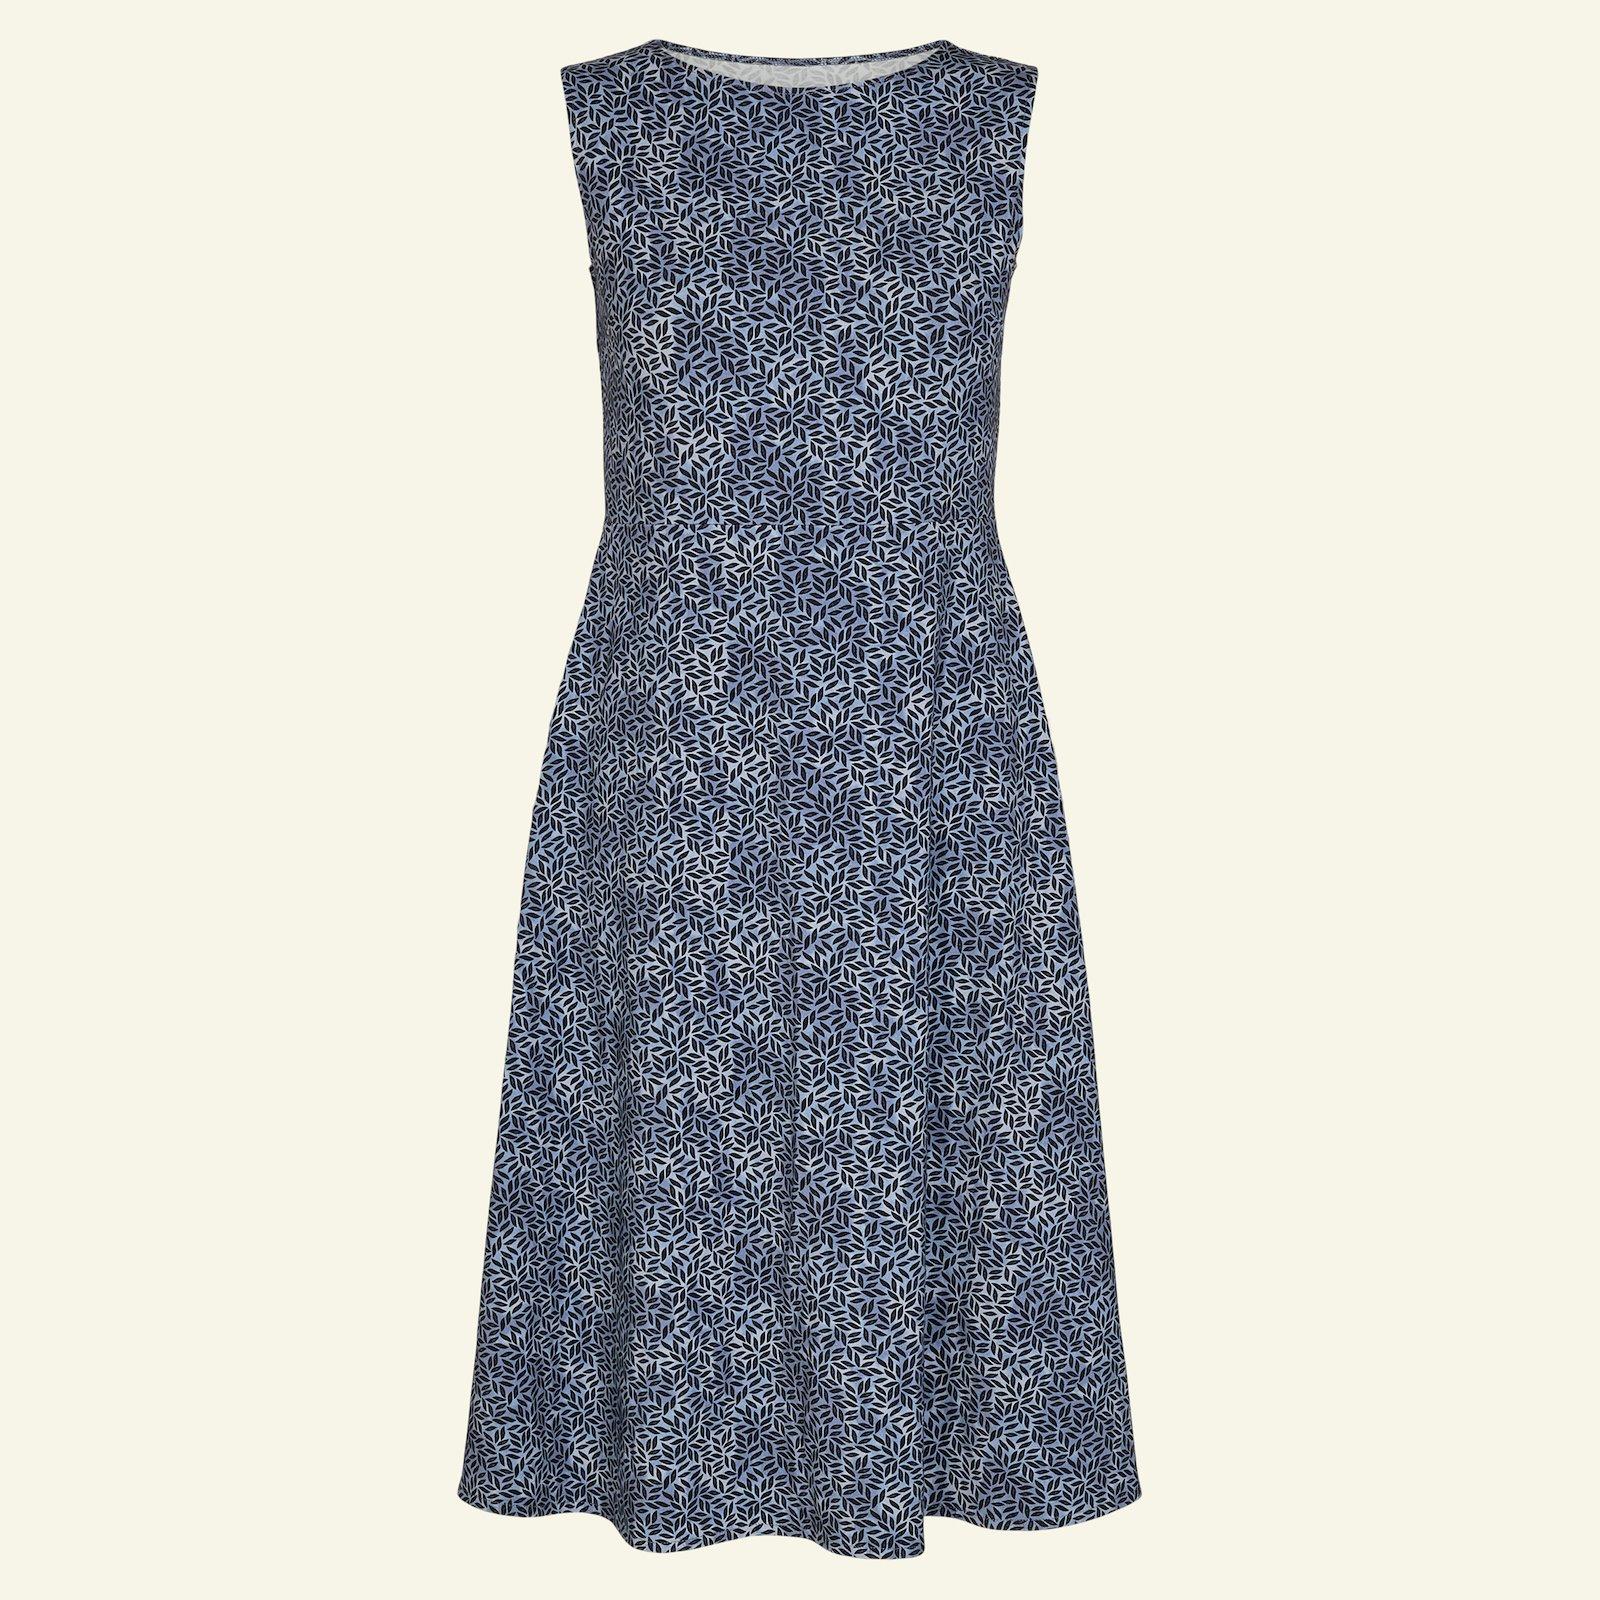 Dress with a full skirt, 34/6 p23154_272689_sskit